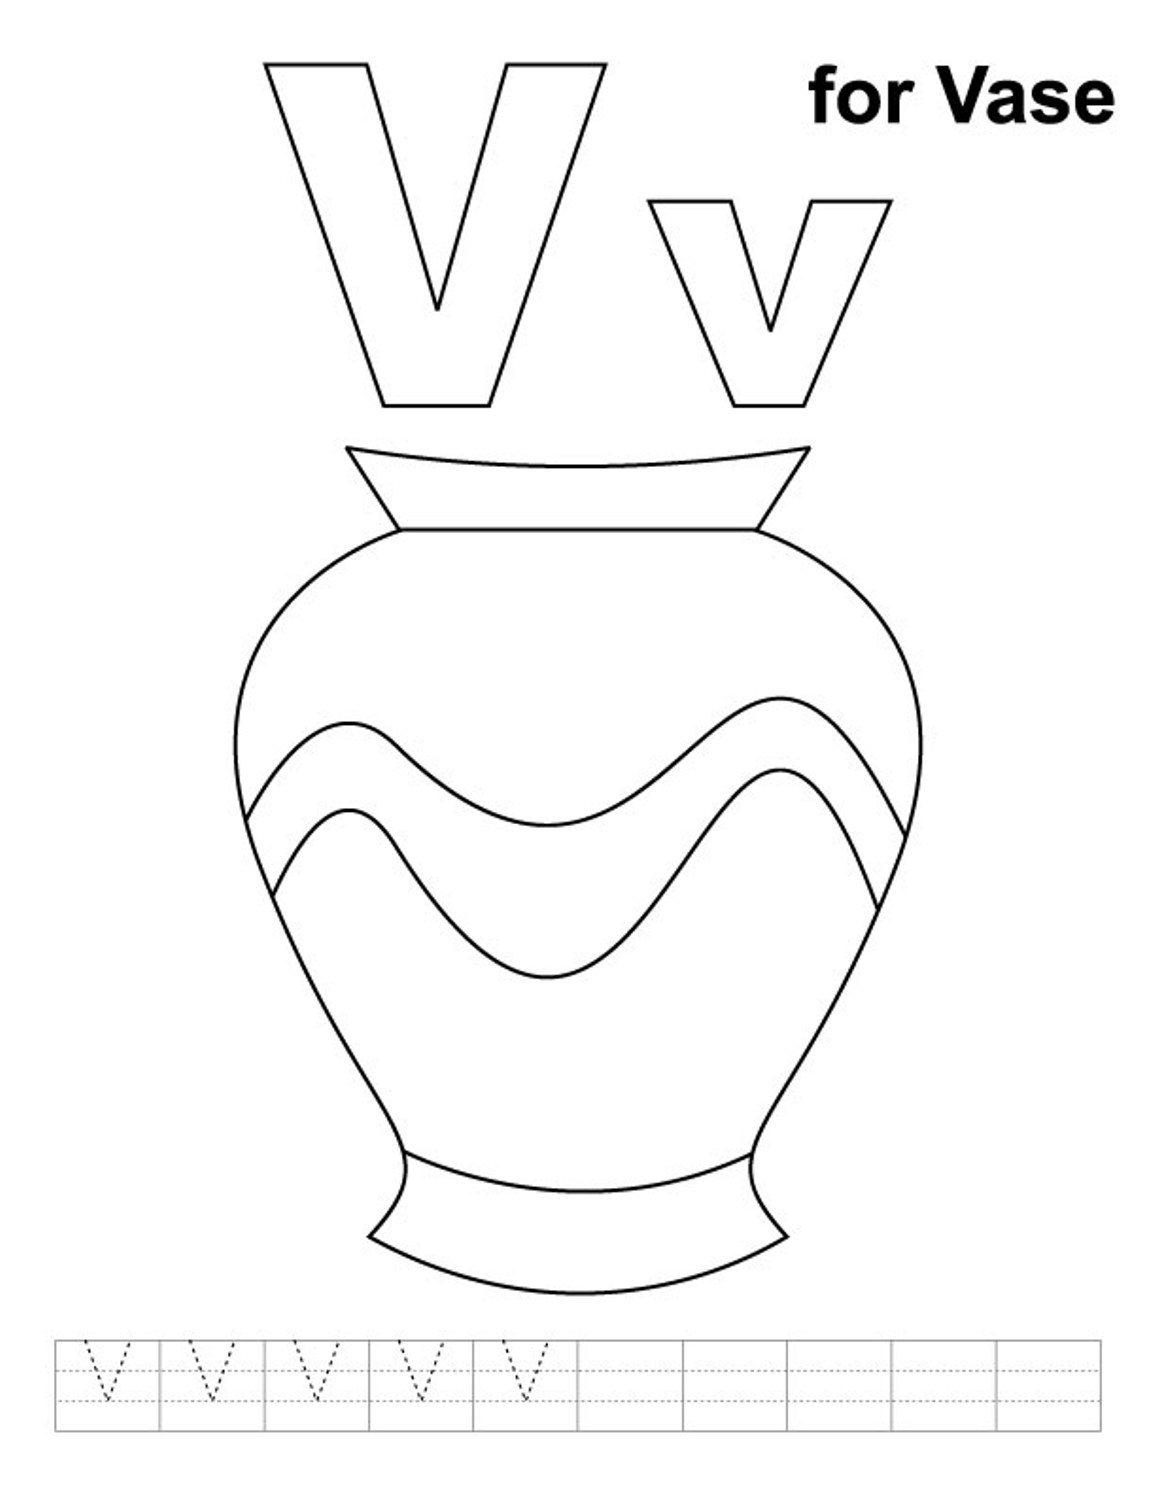 Vase coloring #12, Download drawings